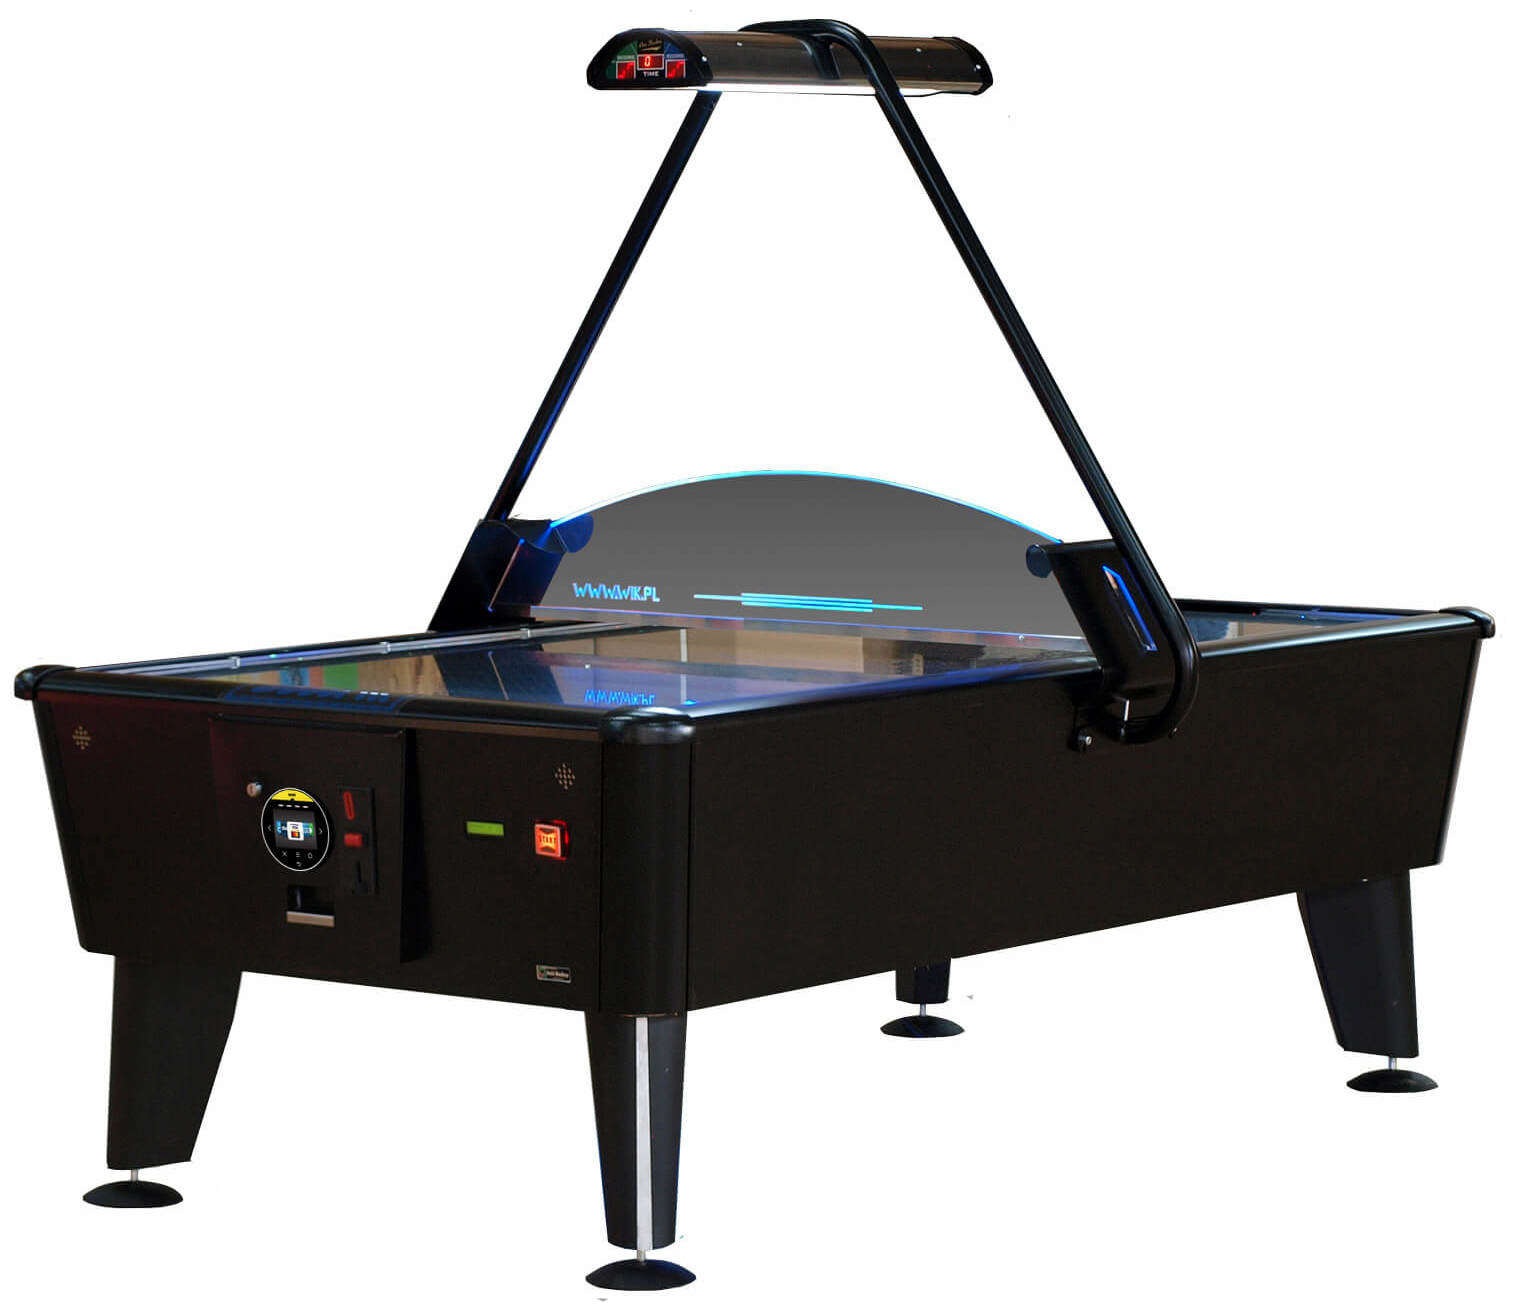 Airhockey ProGames Black Arcade